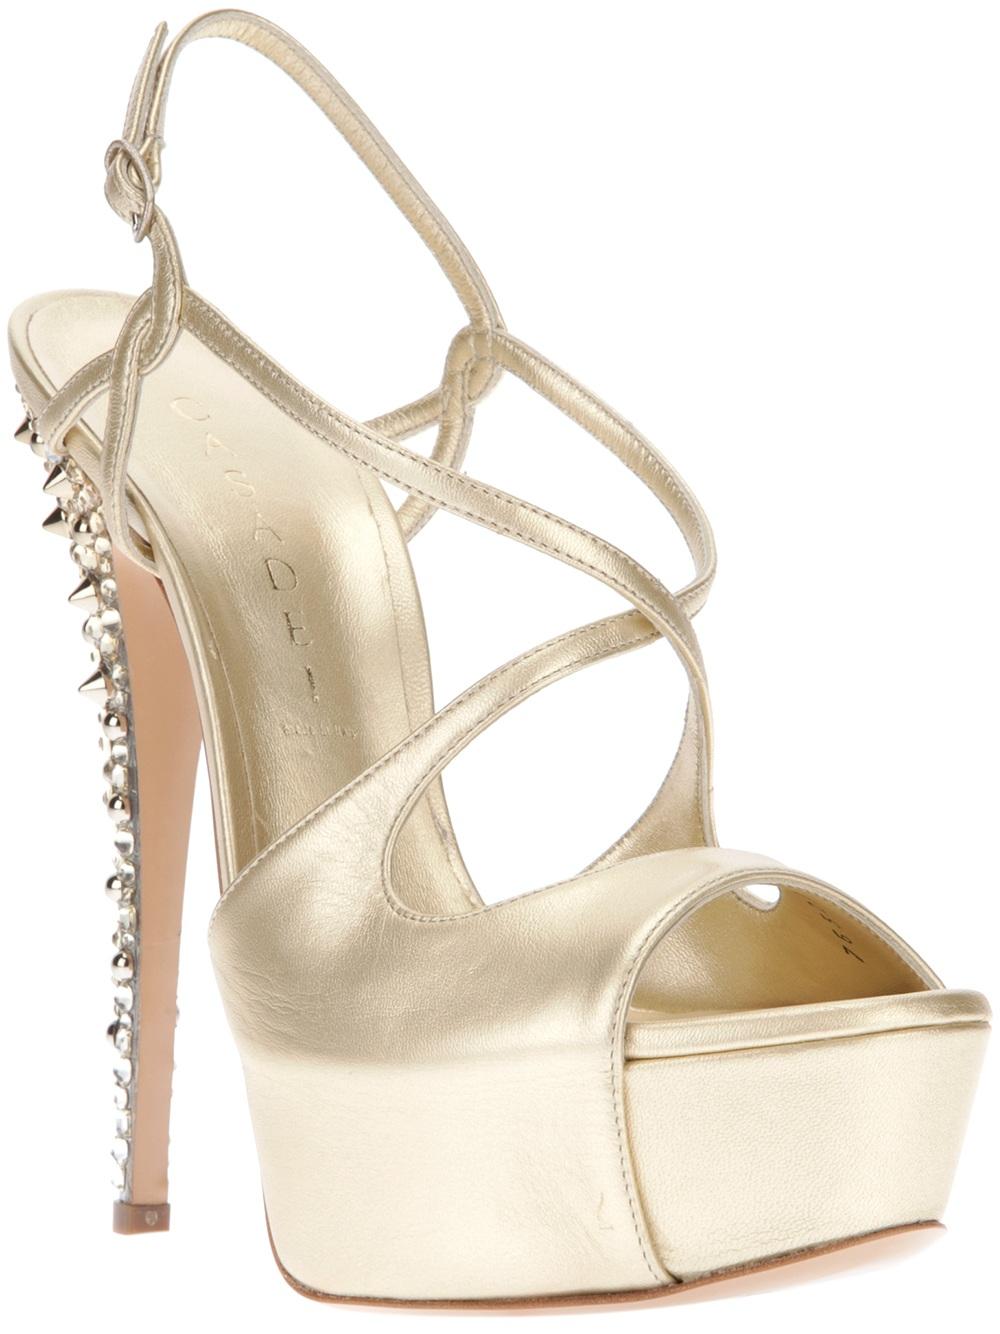 embellished platform sandals - Metallic Casadei Zg3YdyA